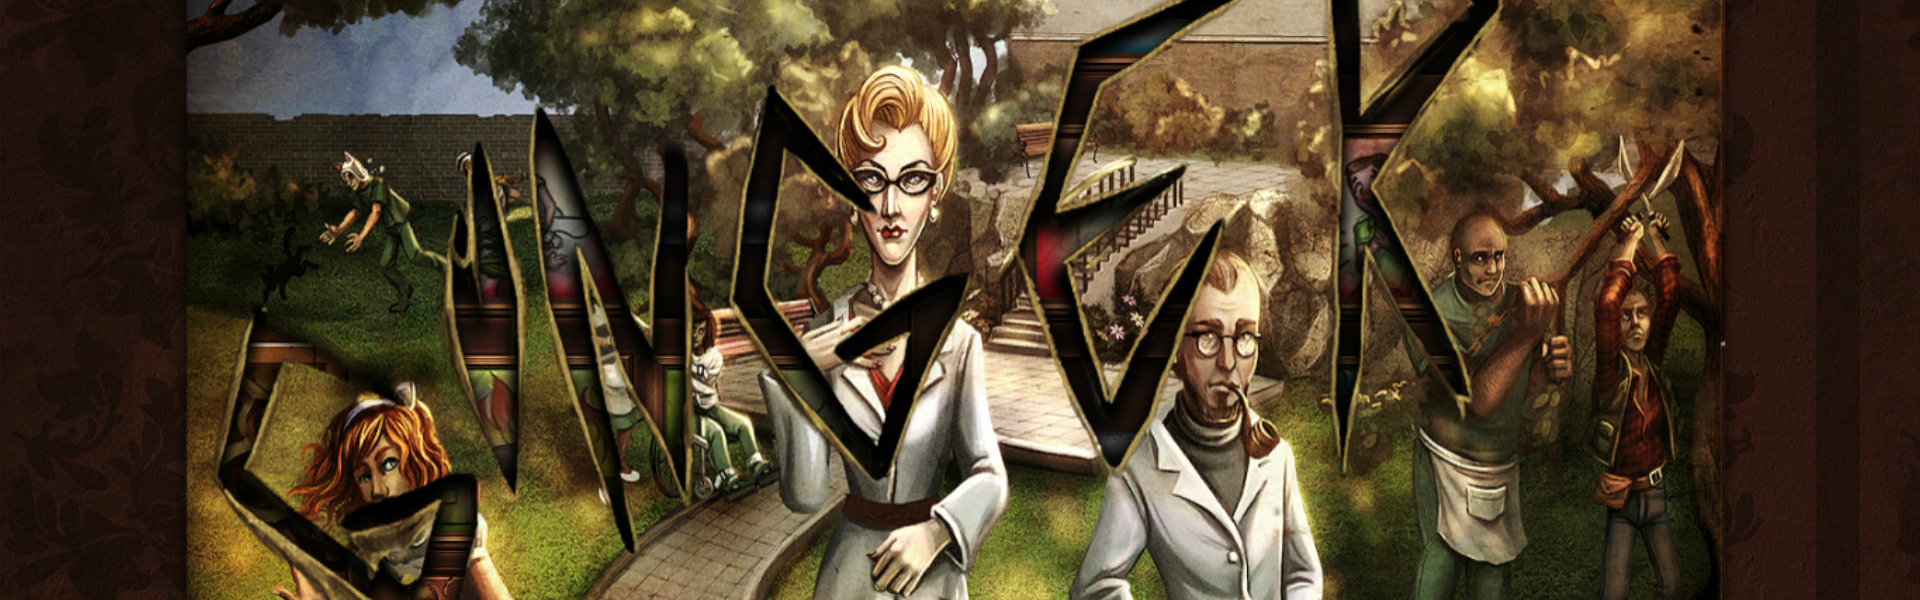 9-clues-2-featured.jpg